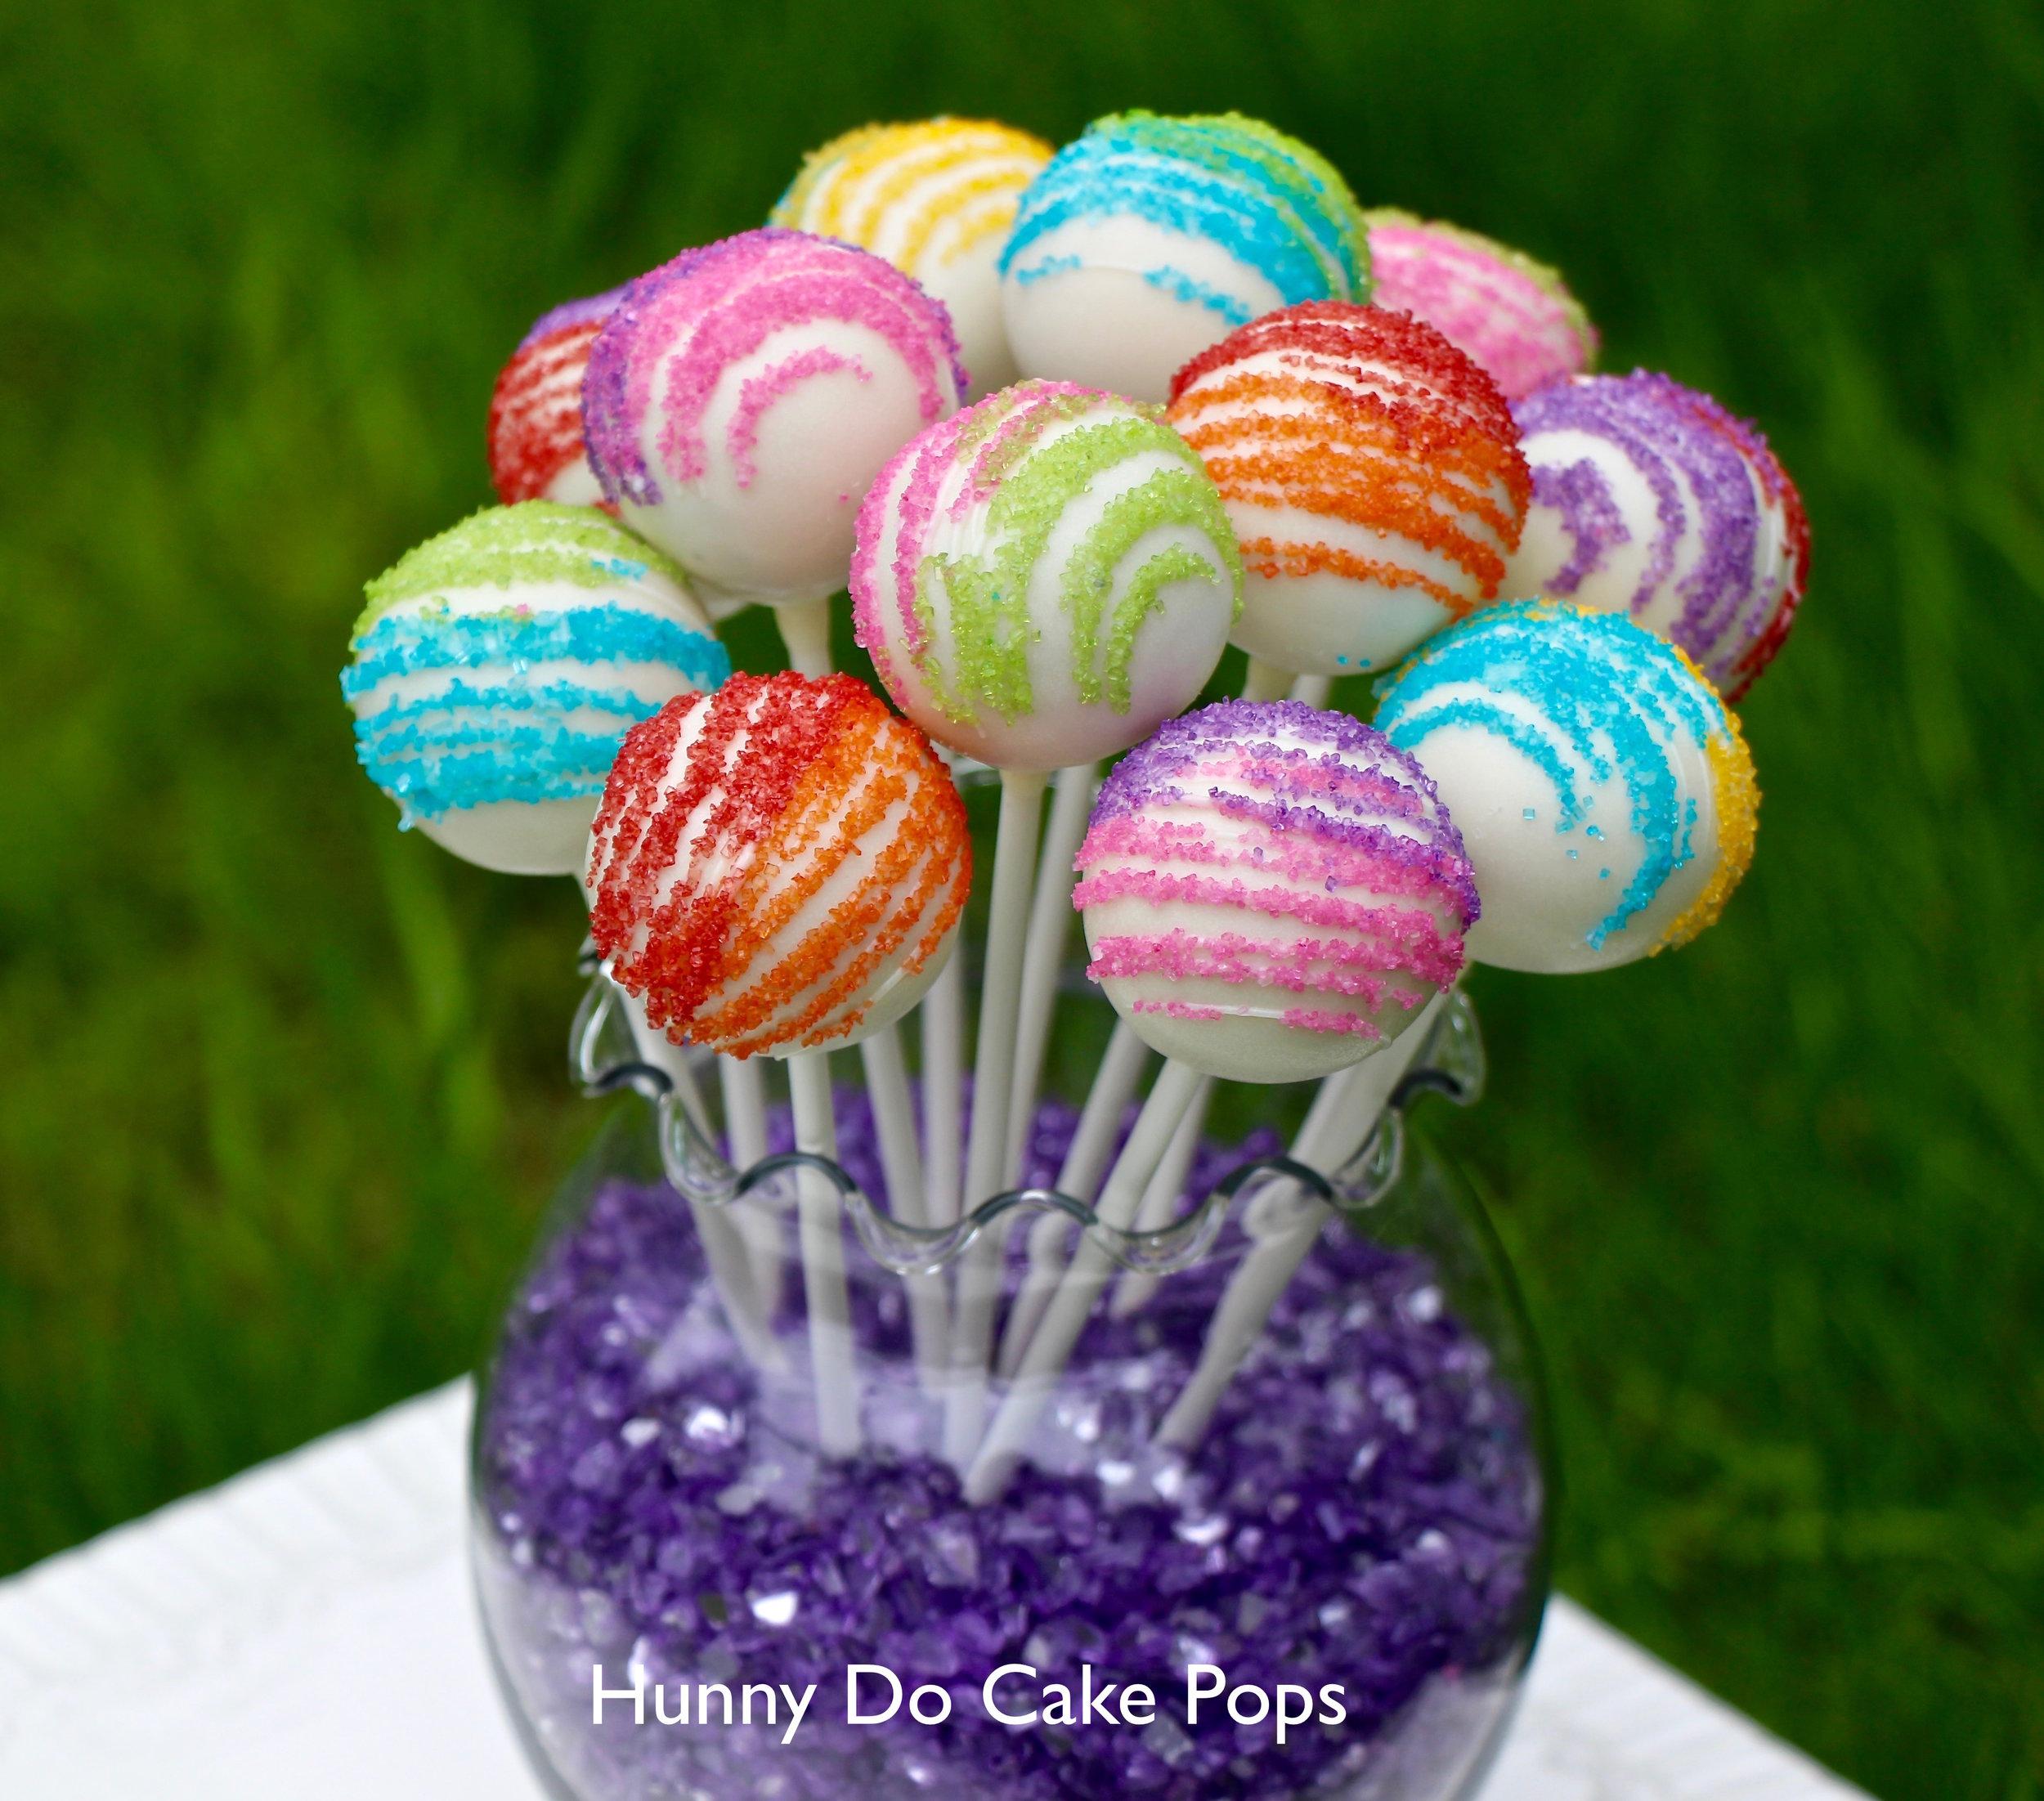 Colorful Cake Pops Bouquet HunnyDo.jpg